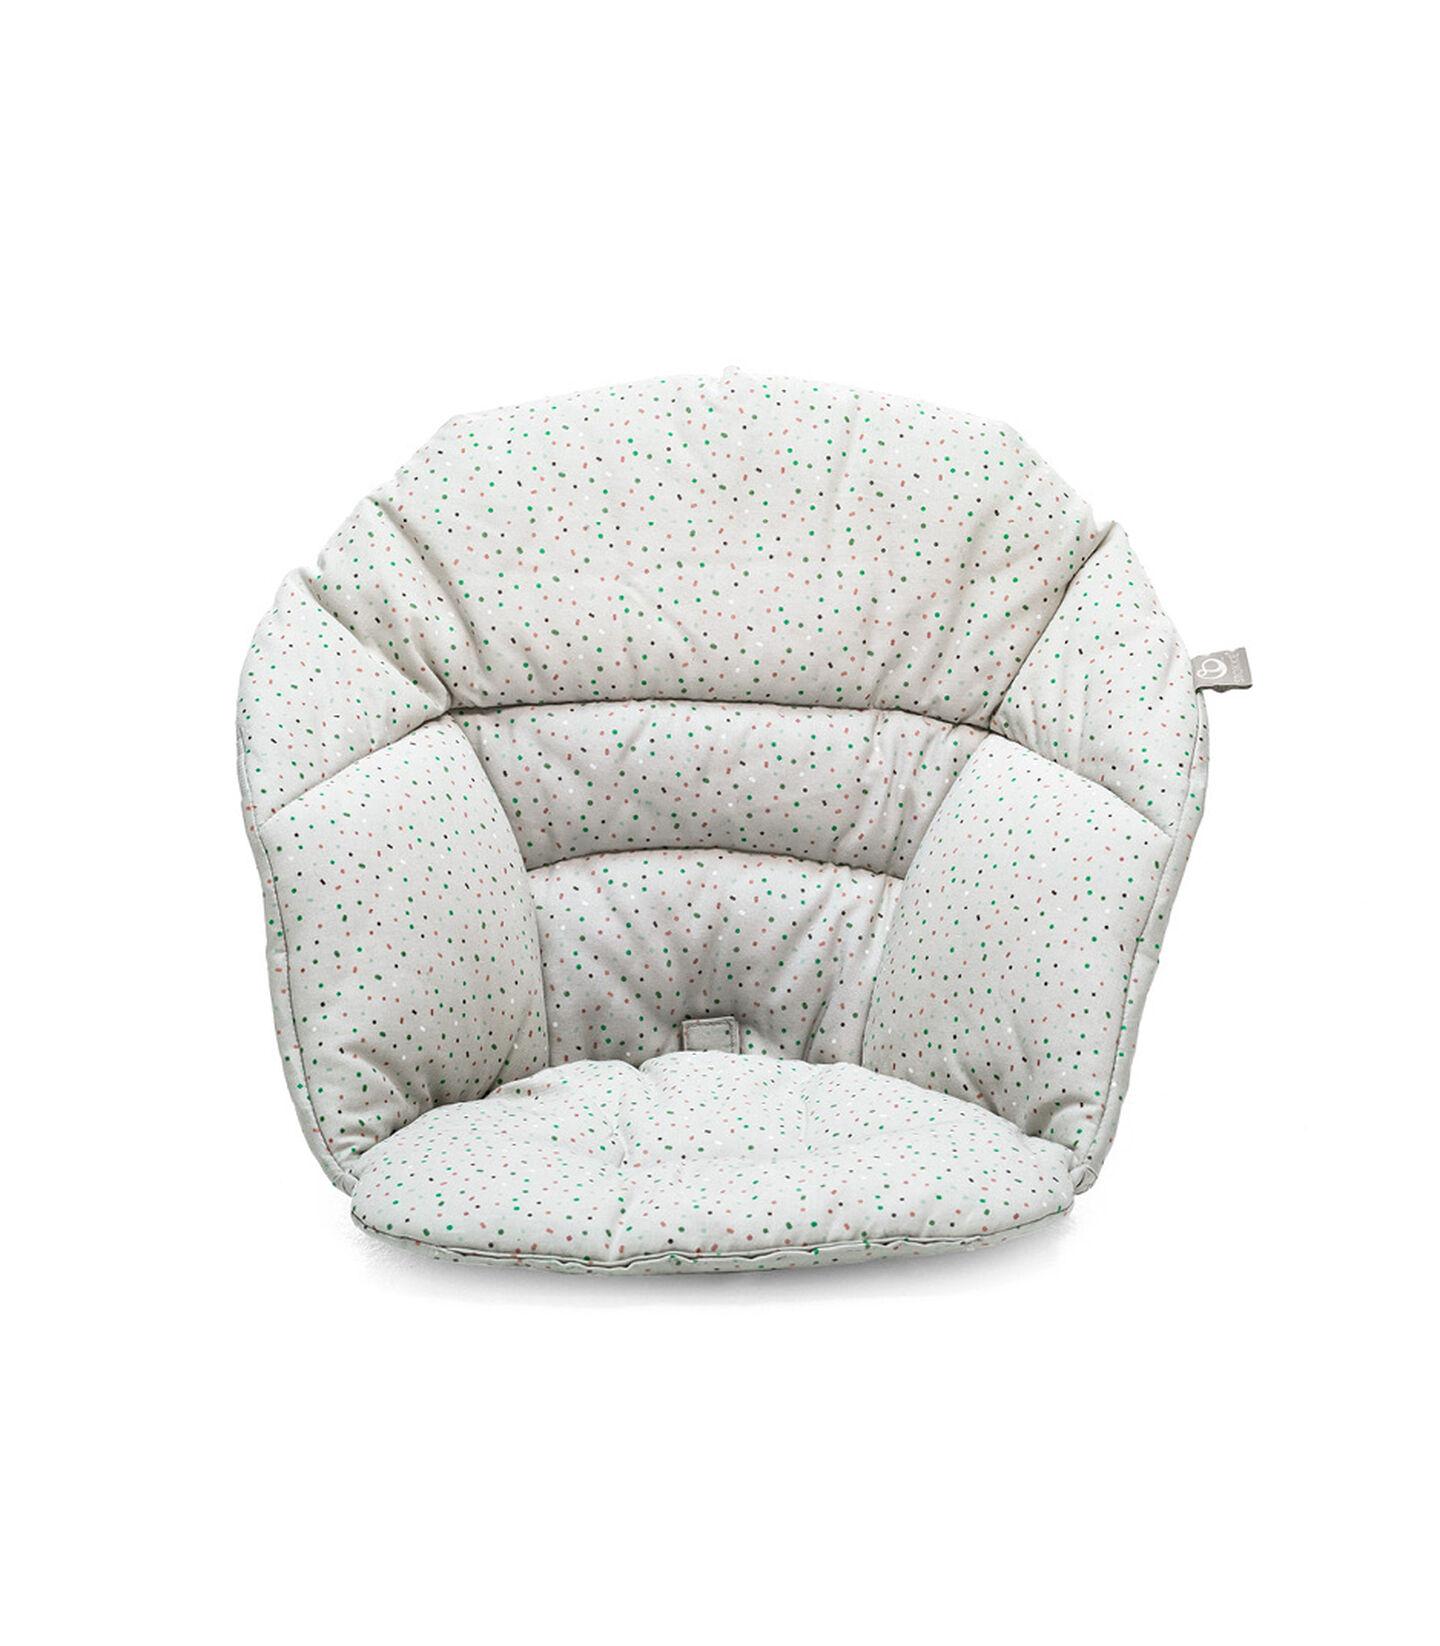 Stokke® Clikk™ Cushion Soft Grey Sprinkles, Grey Sprinkles, mainview view 1